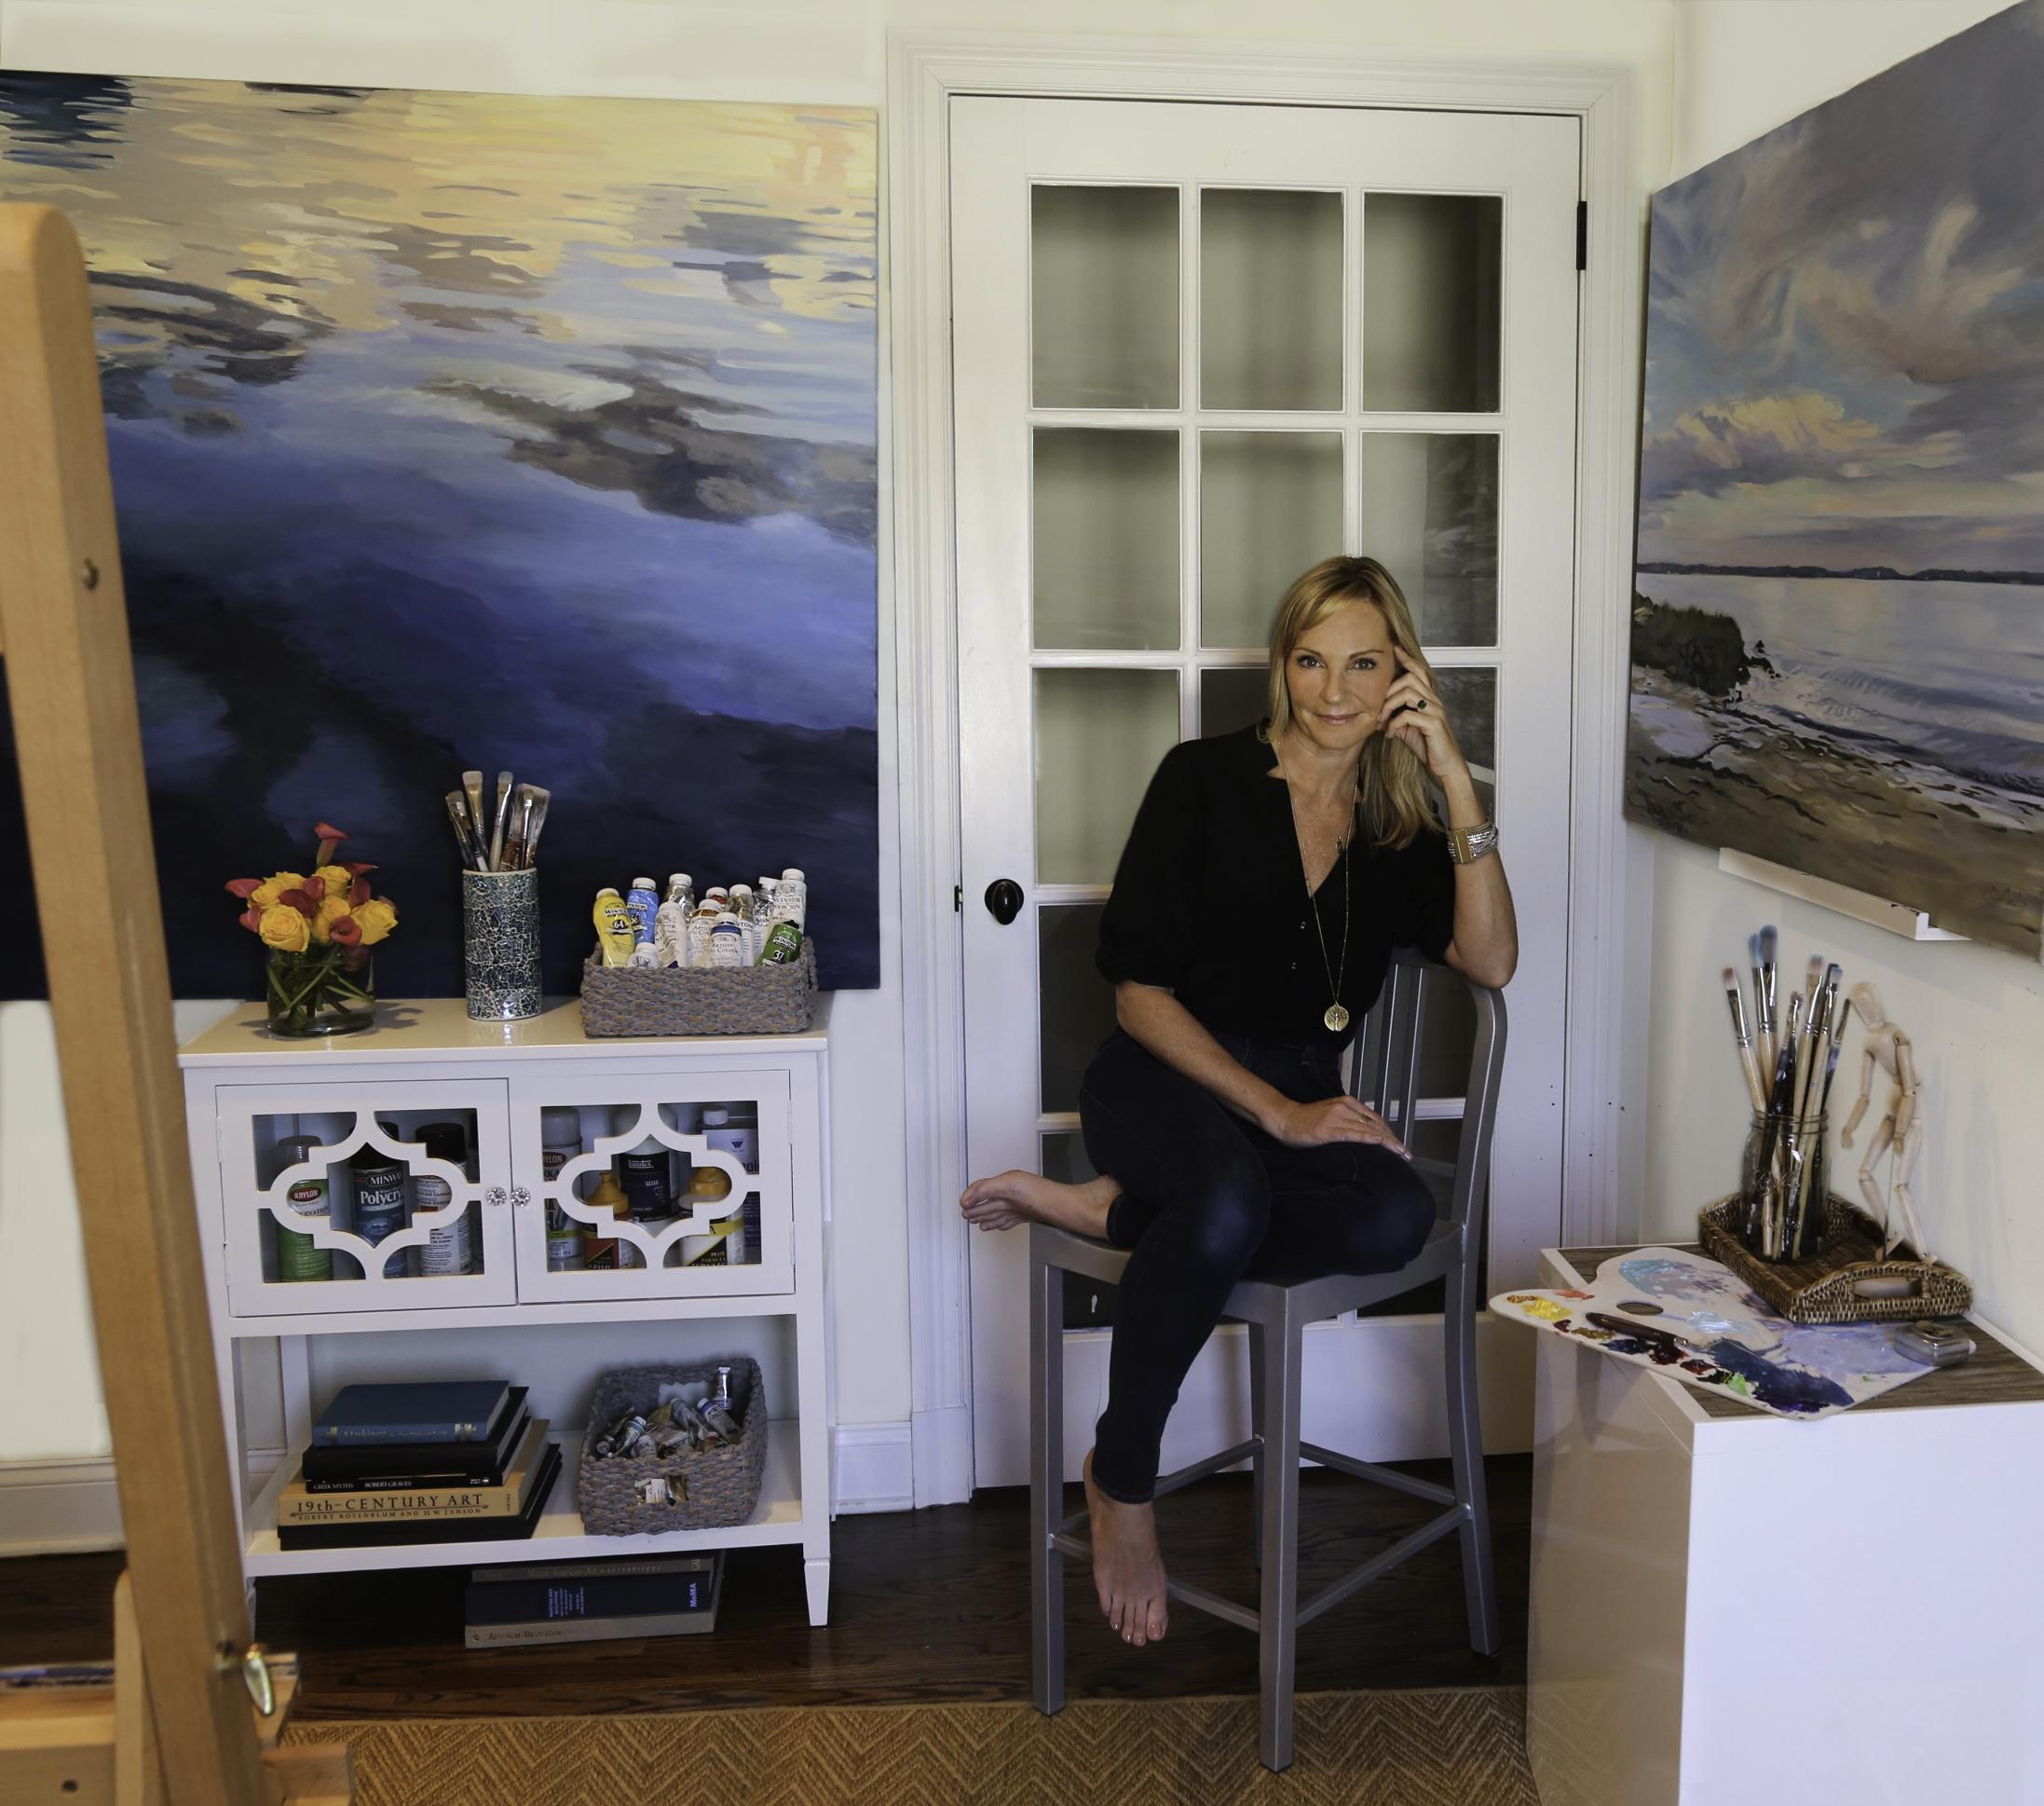 ARTIST IN HER STUDIO RYE, NY  Katherine-coleman photography